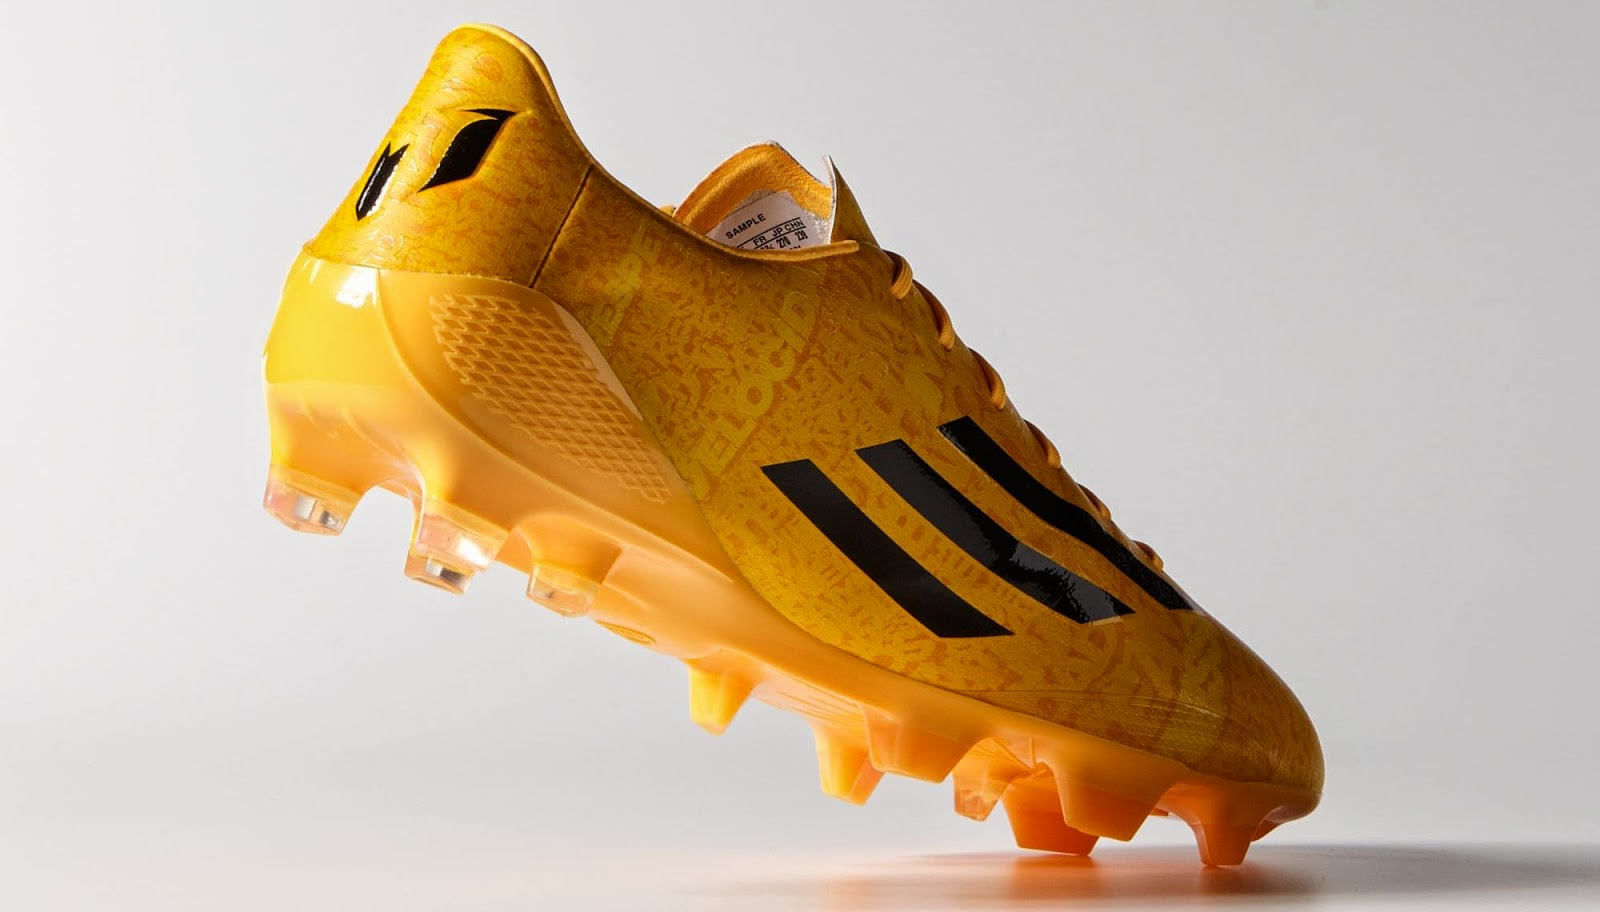 Adidas F50 adiZero 4 Messi Edition - solar gold-black-black - 4.jpg